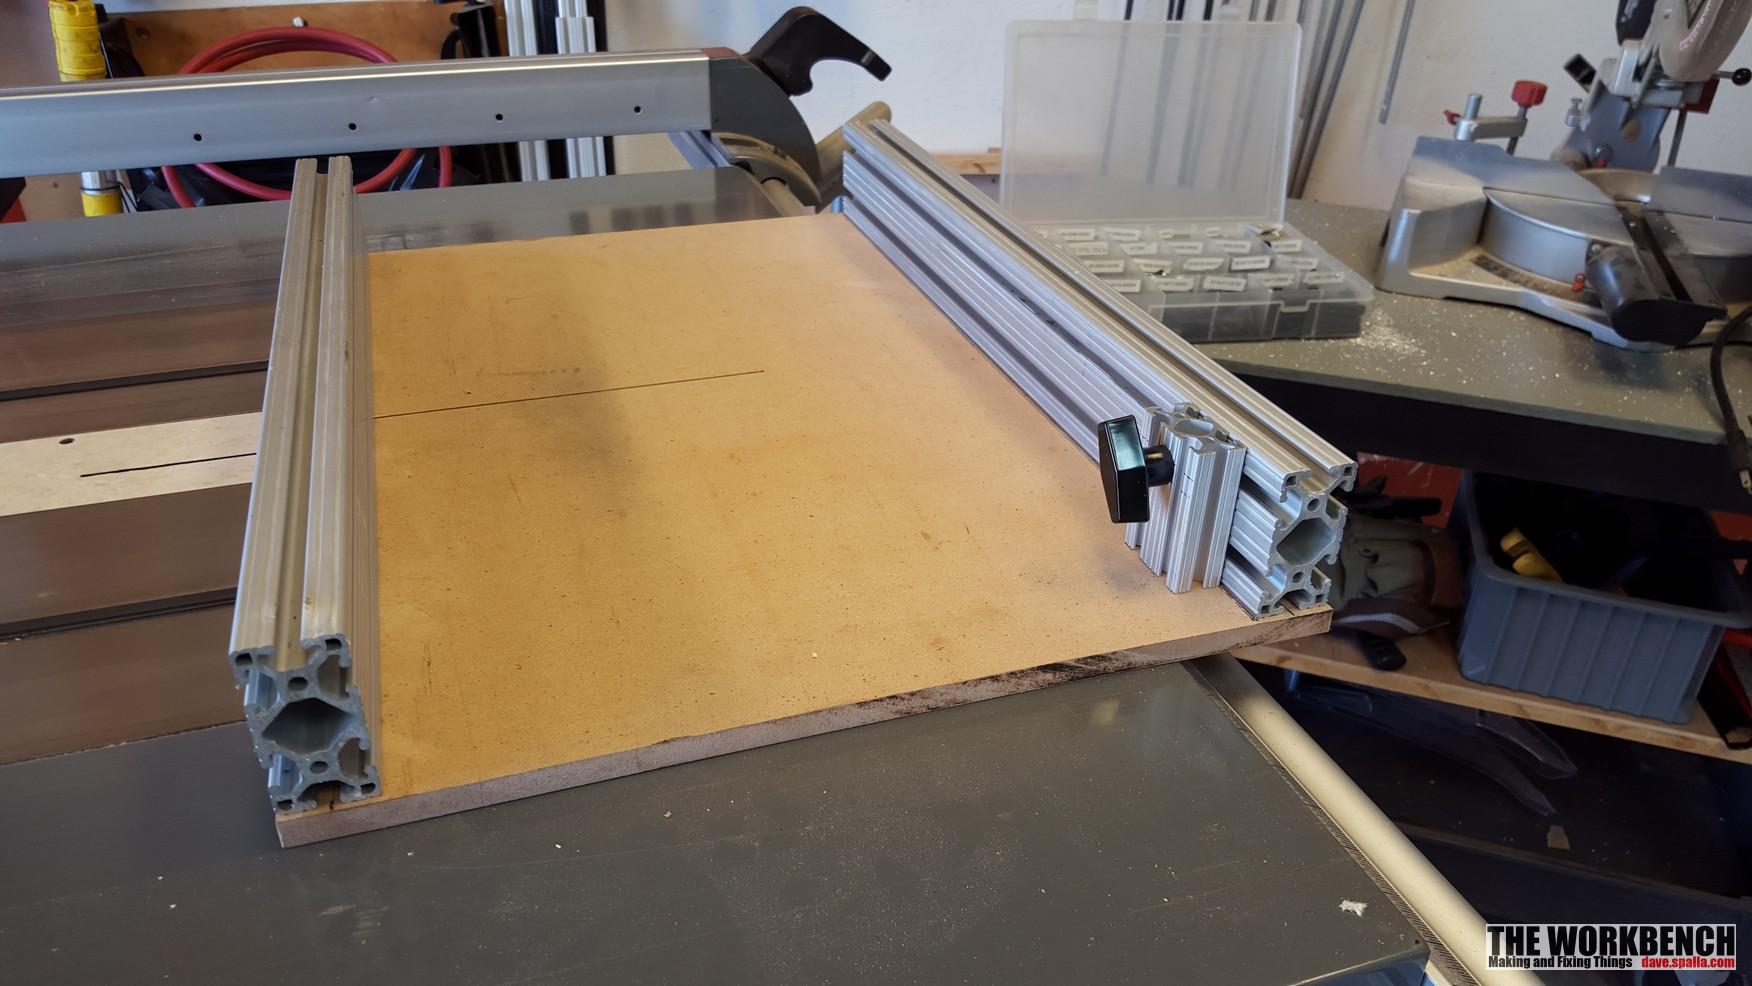 Tablesaw Cross Cut Sled The Workbench